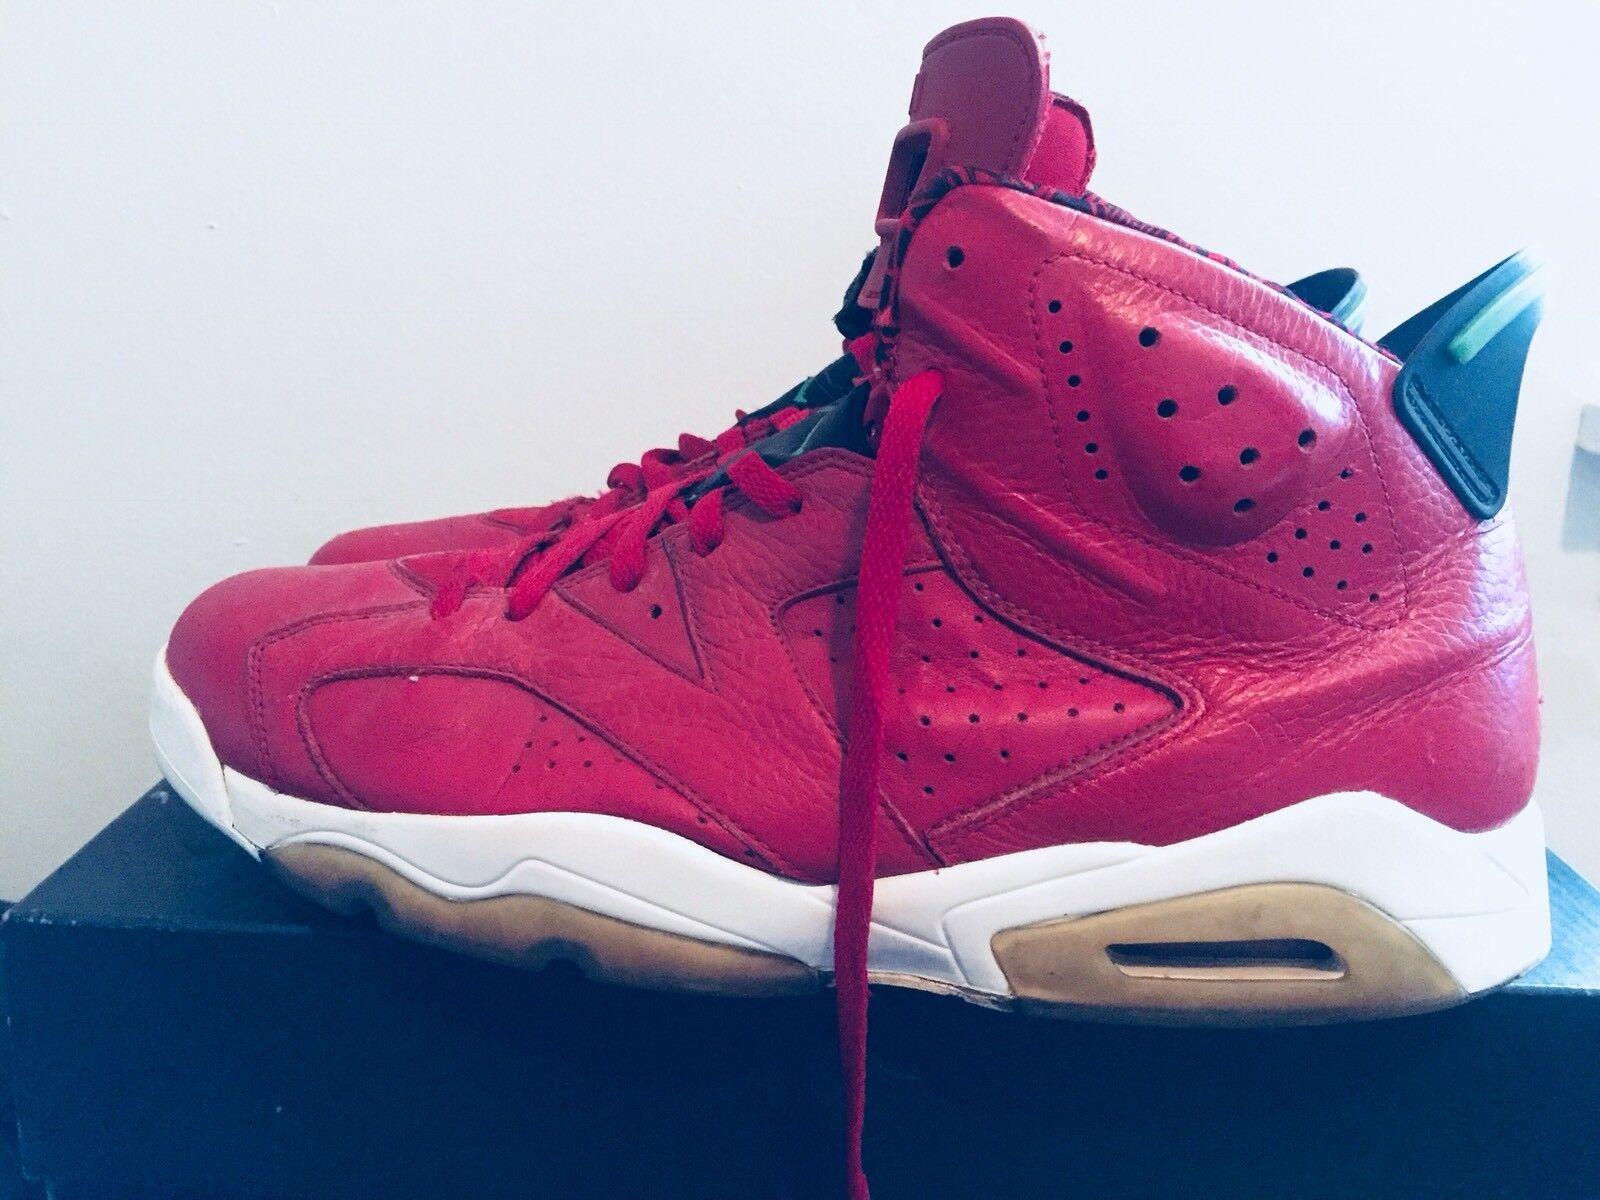 2018 Mens Nike Air Jordan VI 6 Spizike History of Jordan Red Comfortable New shoes for men and women, limited time discount